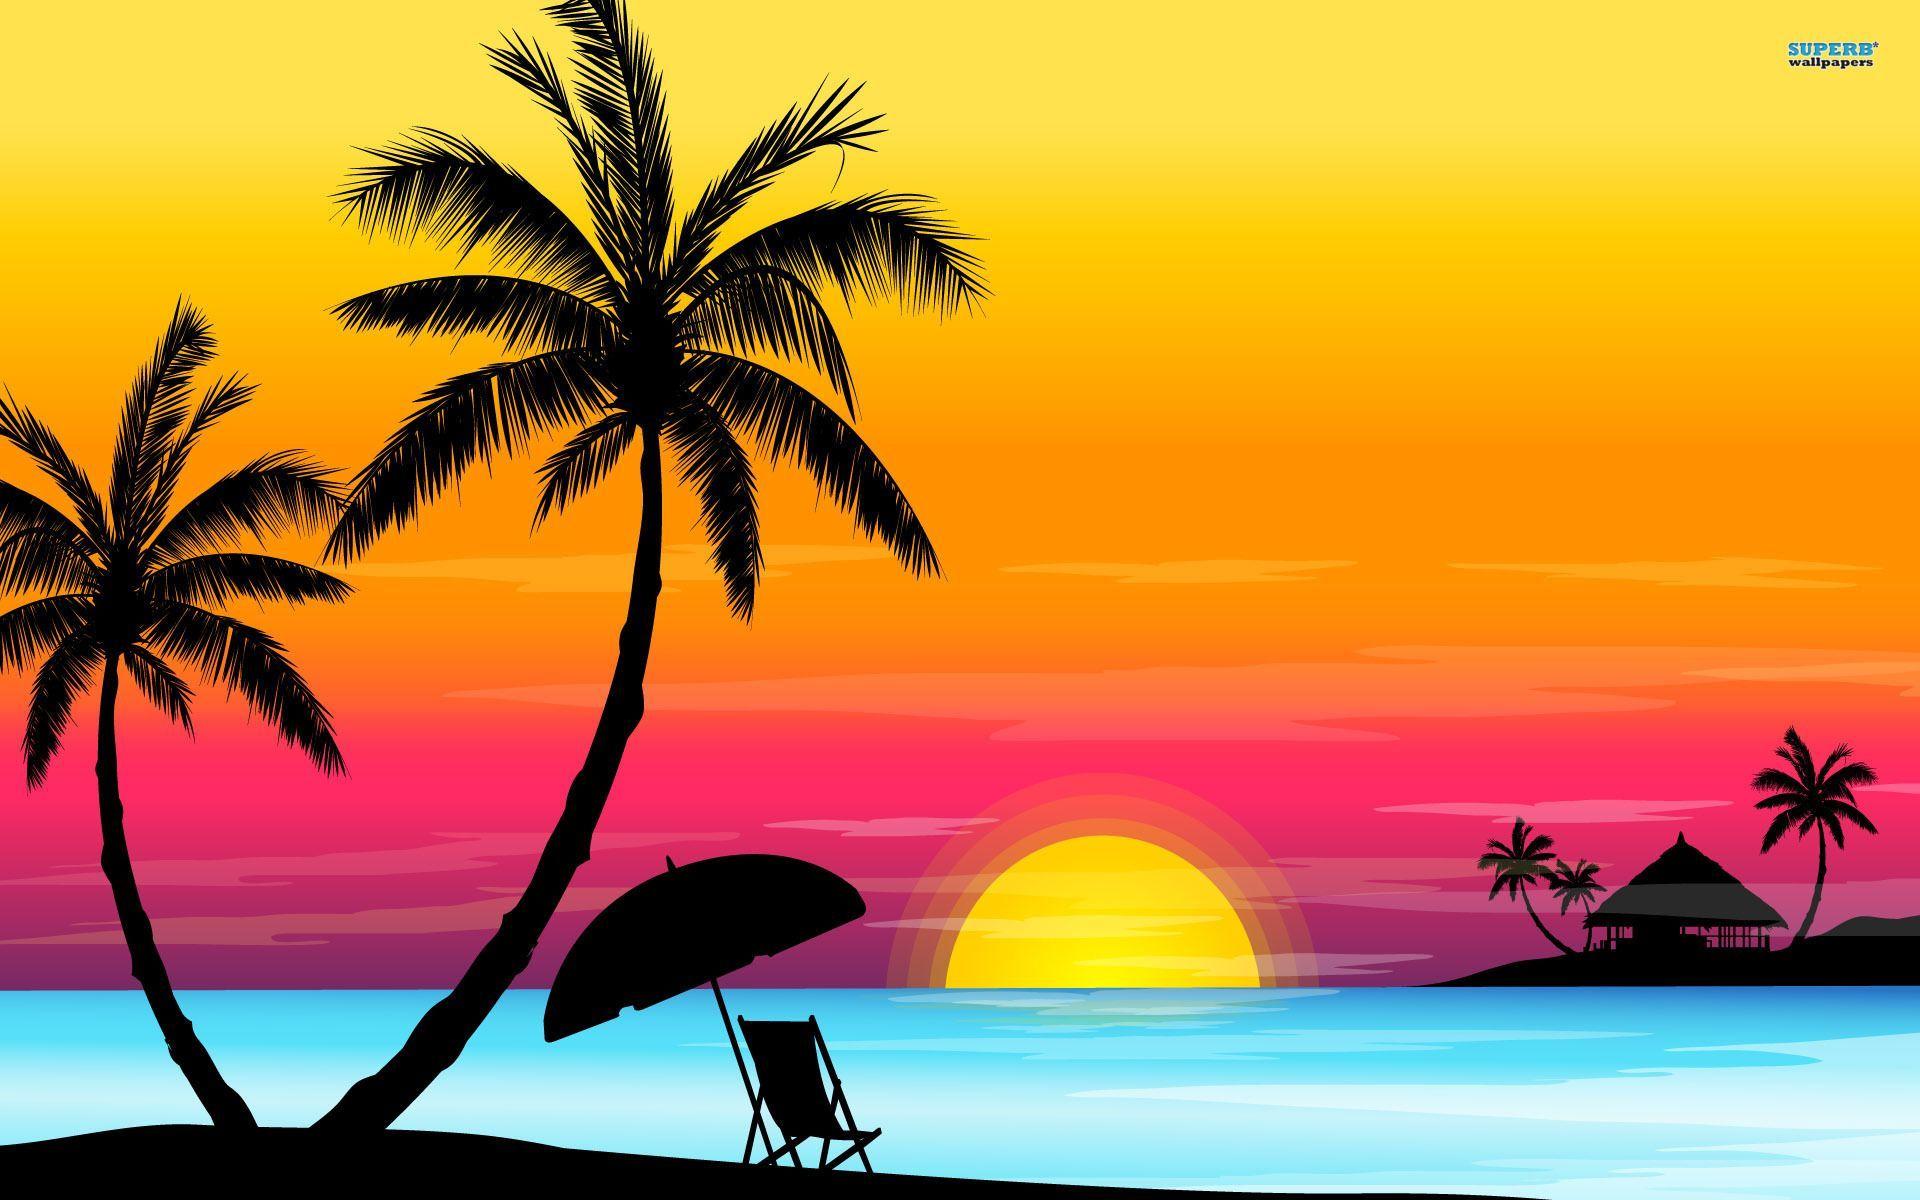 tropical wallpapers download. Sunset clipart hawaiian sunset